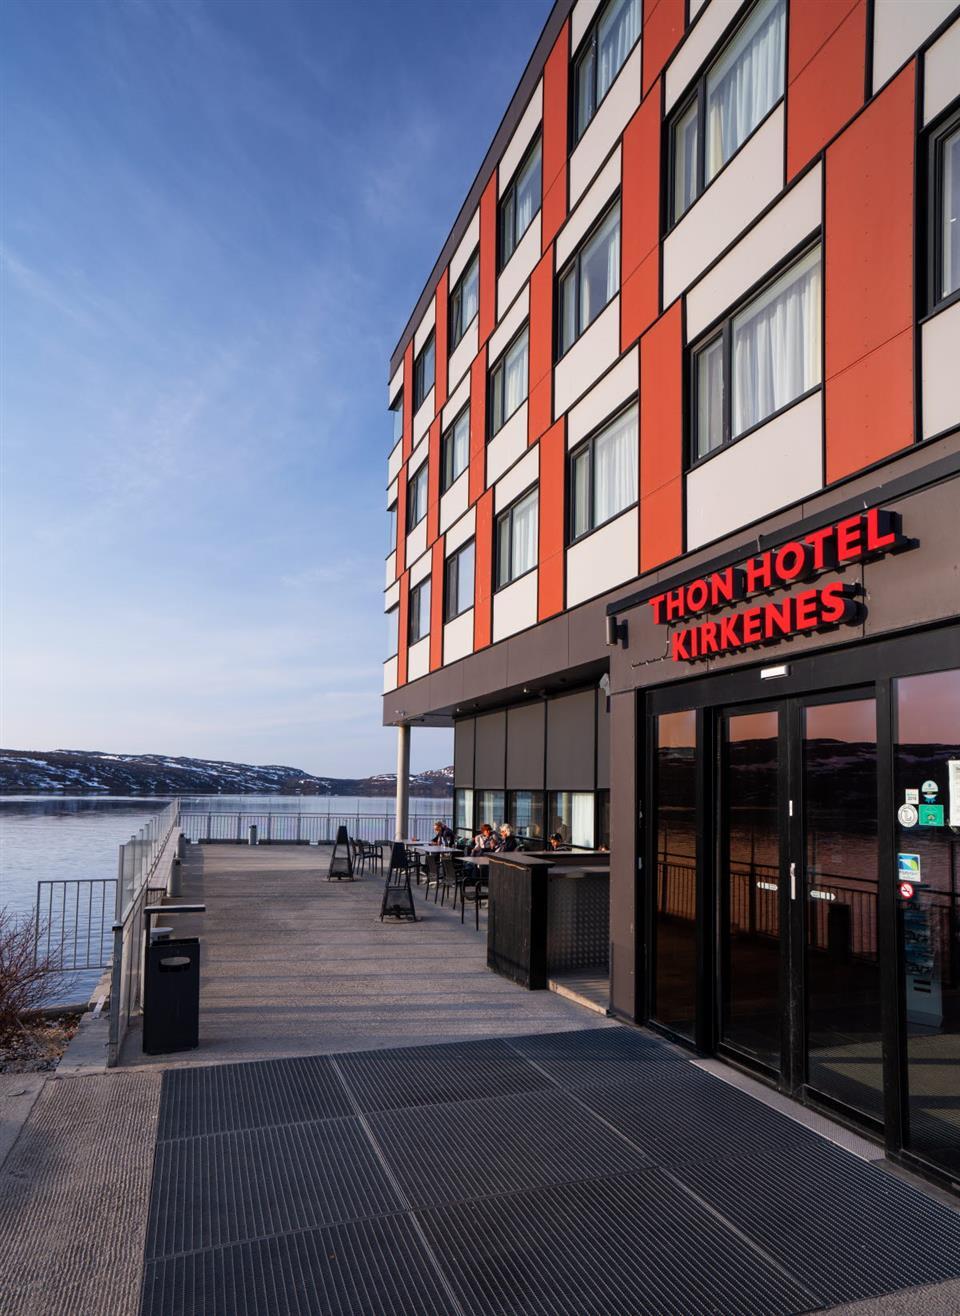 Thon Hotel Kirkenes Fasade